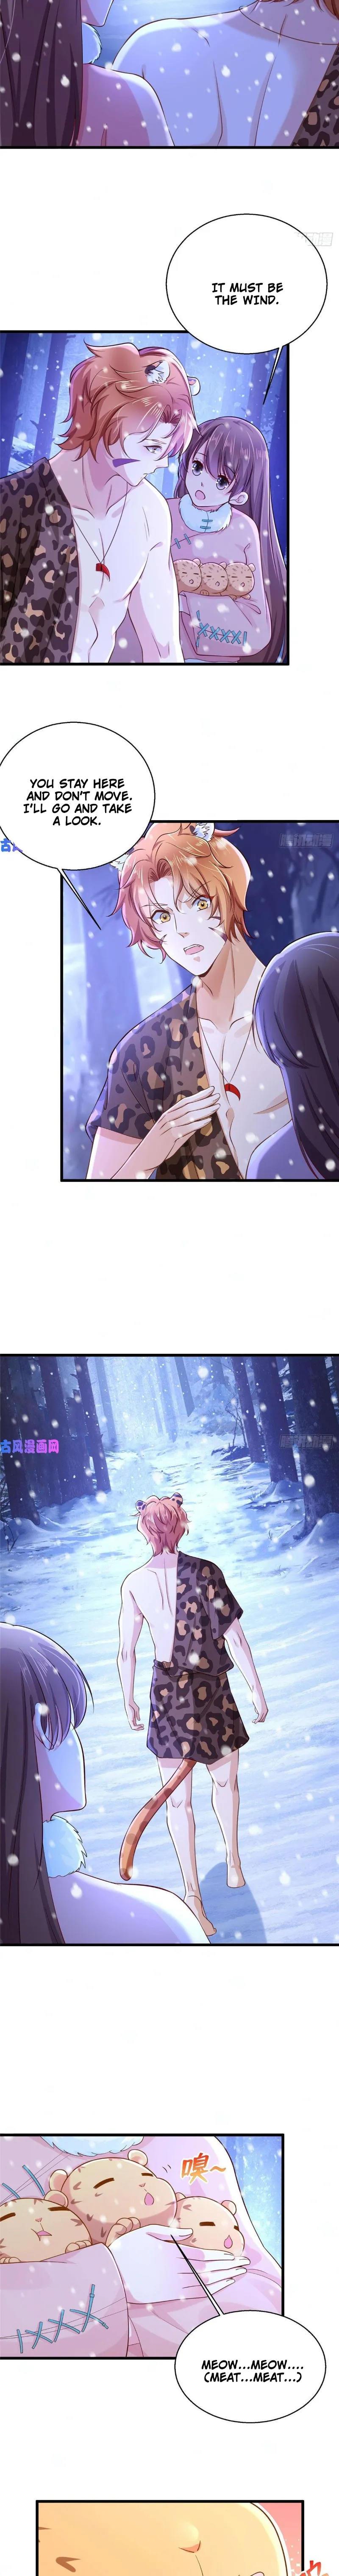 Beauty And The Beasts Chapter 274 page 3 - Mangakakalots.com